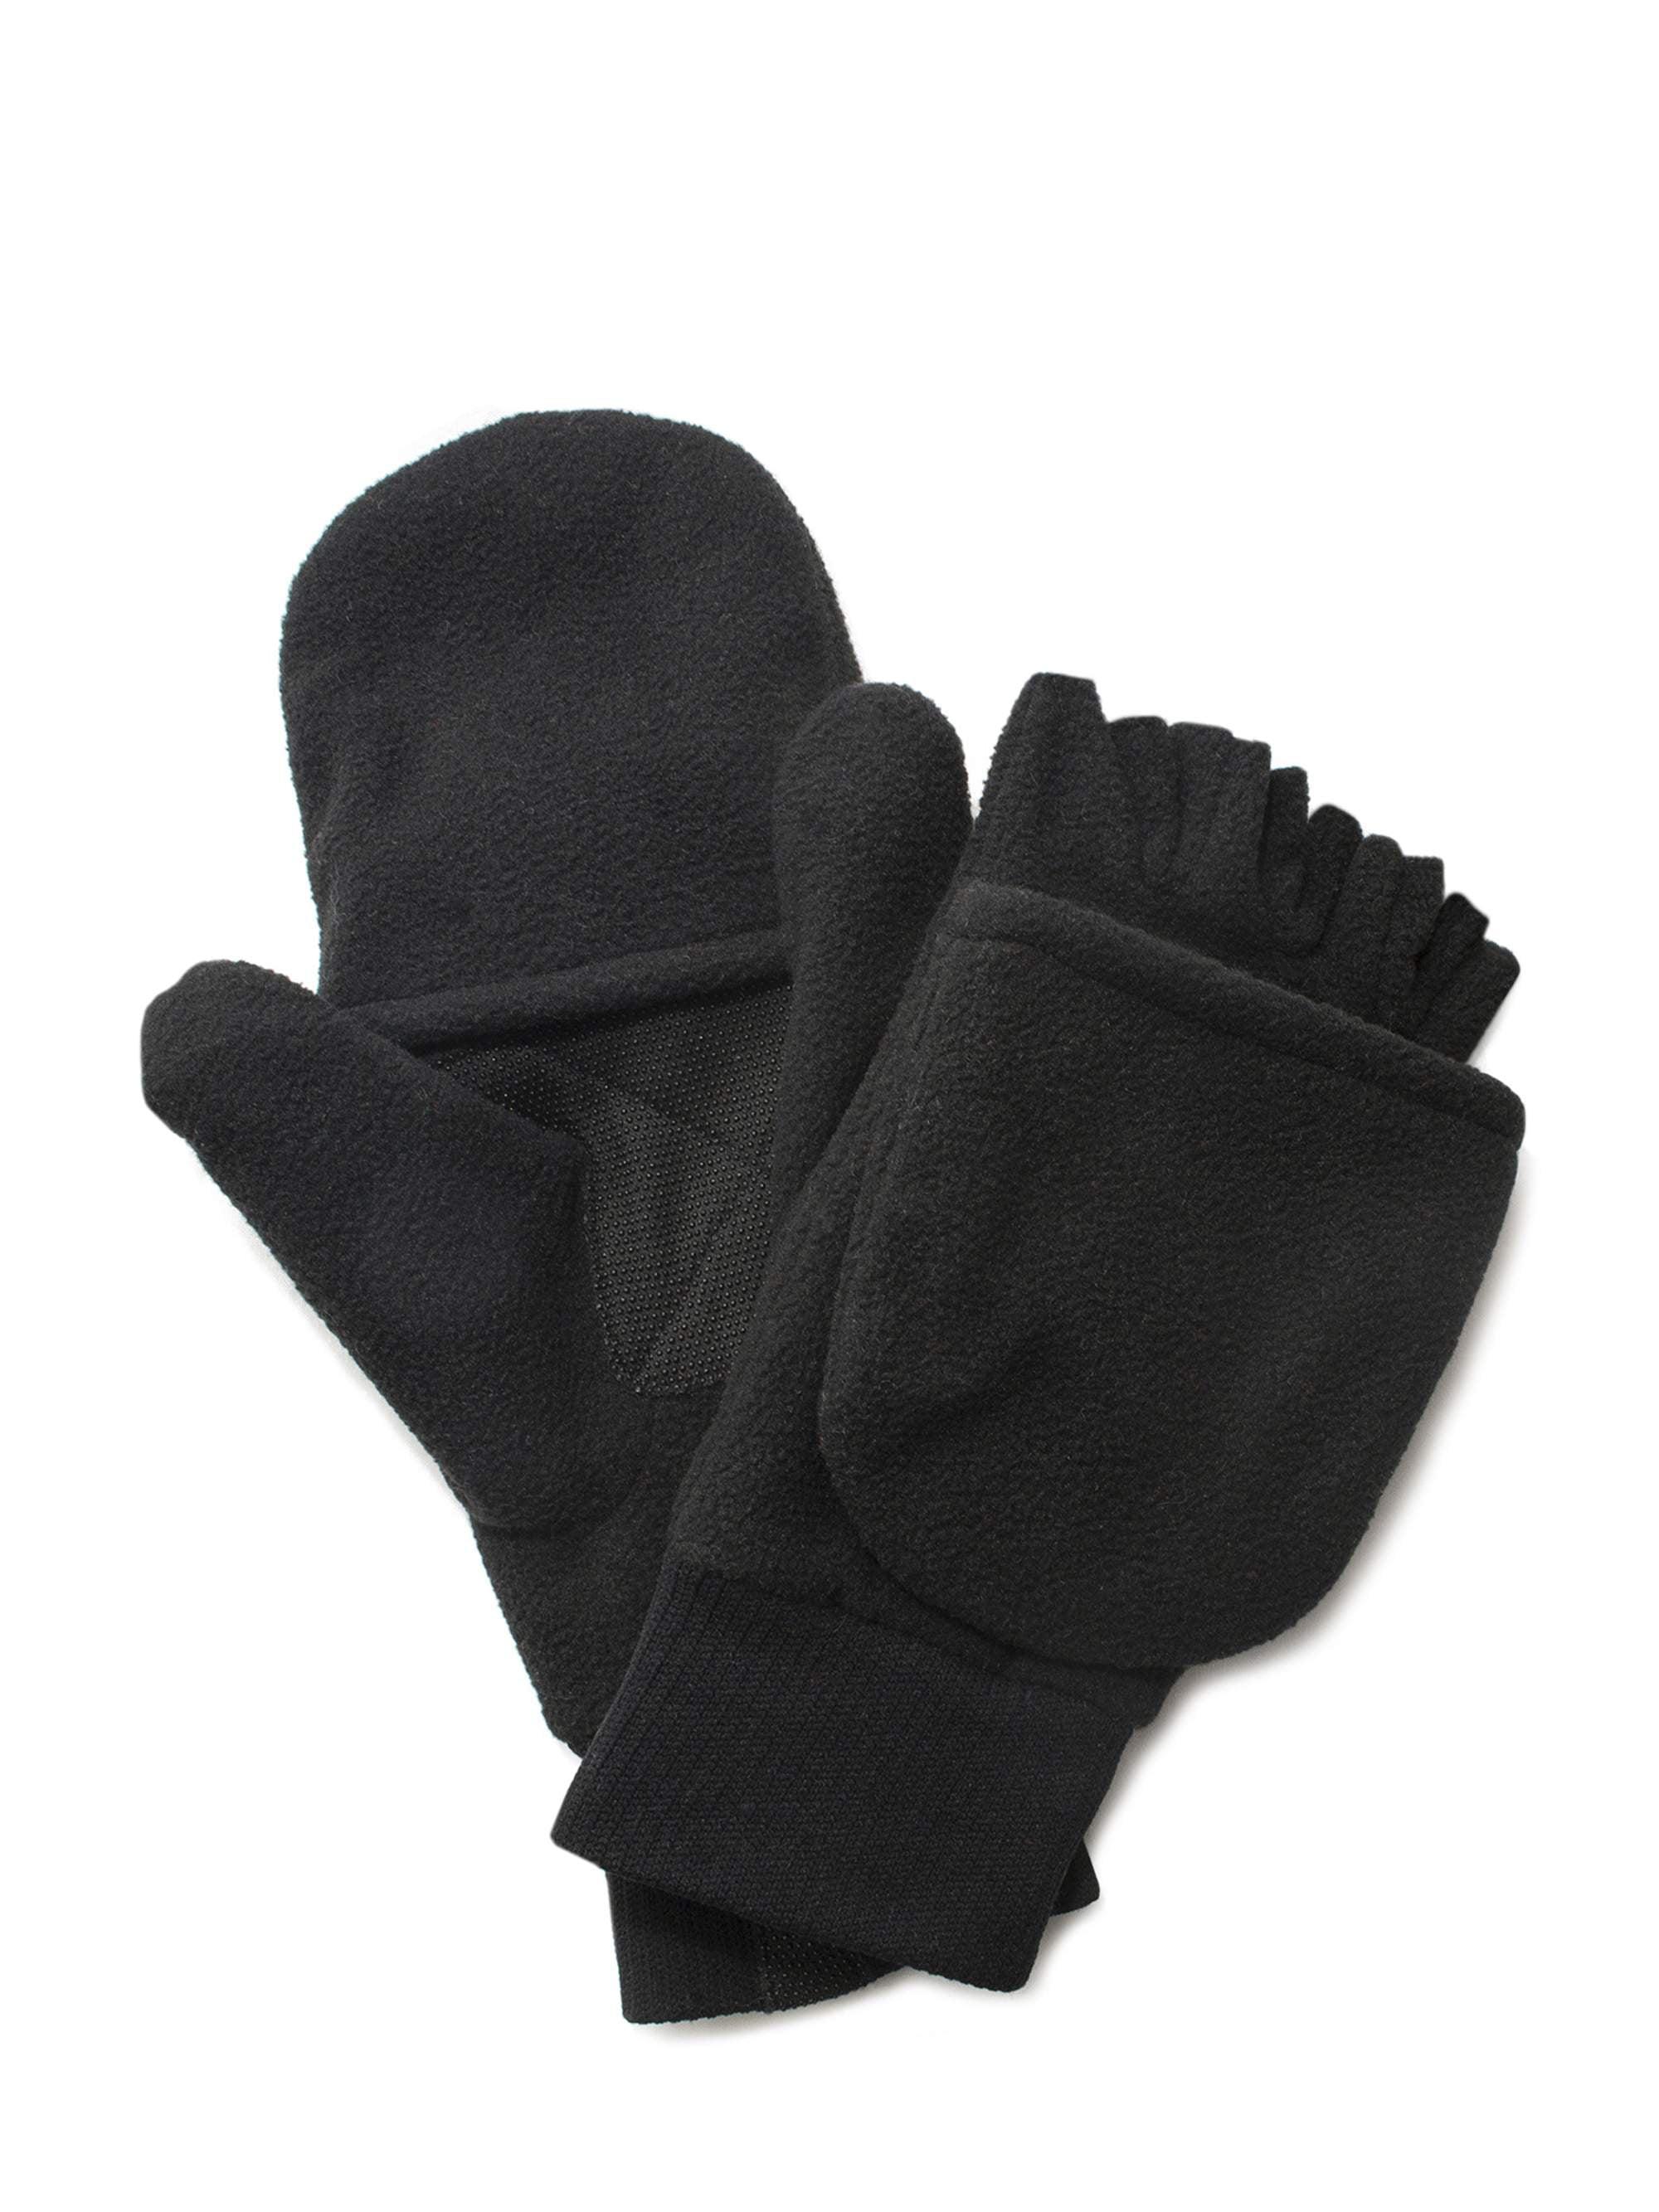 QuietWear Fleece Flip Mitten with 40 Gr Thinsulate by Overstock